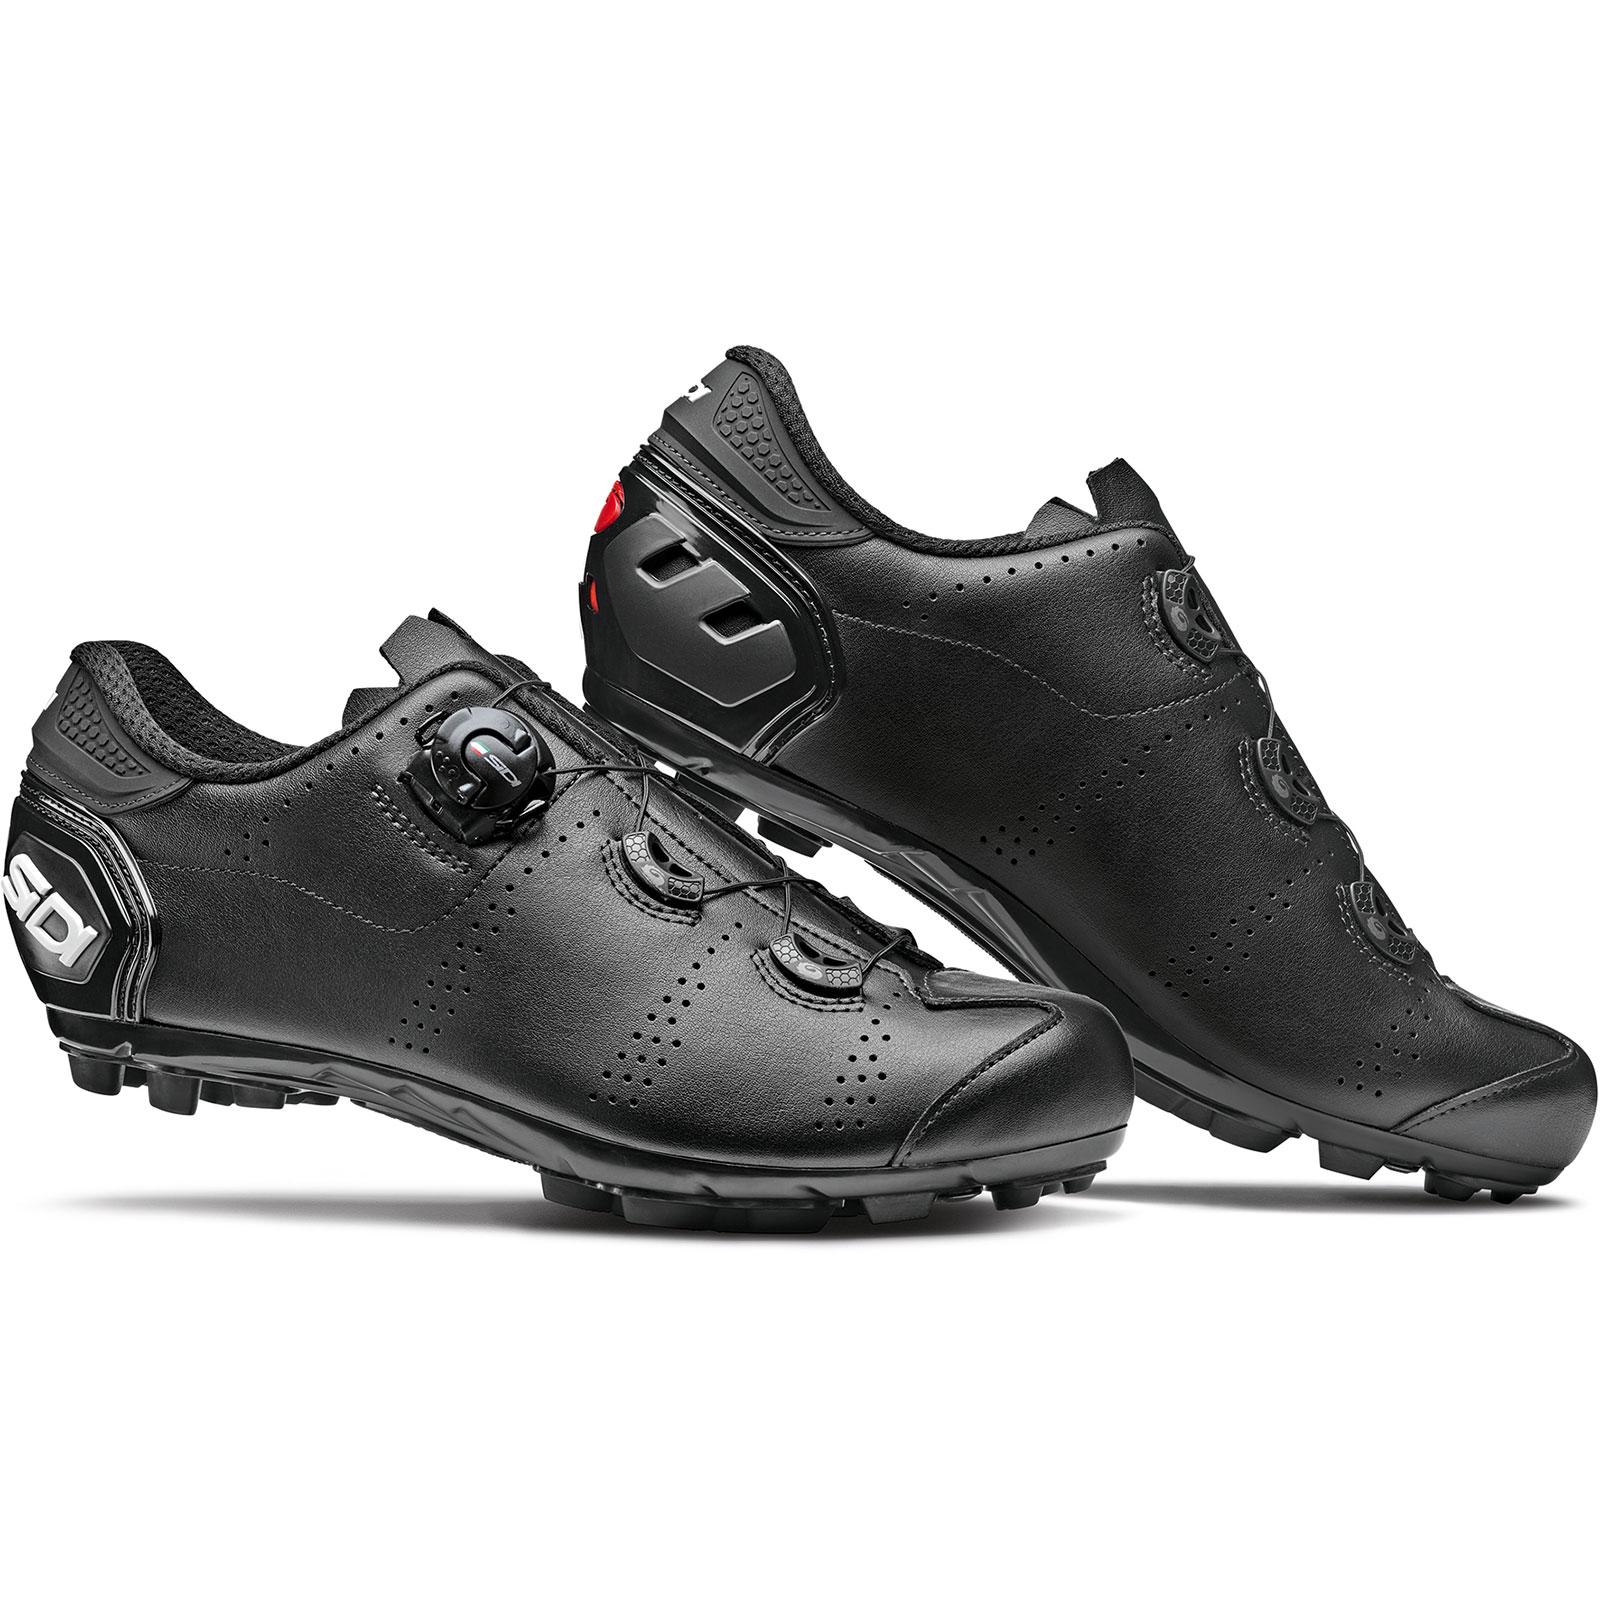 Sidi Speed Zapatillas MTB - black/black